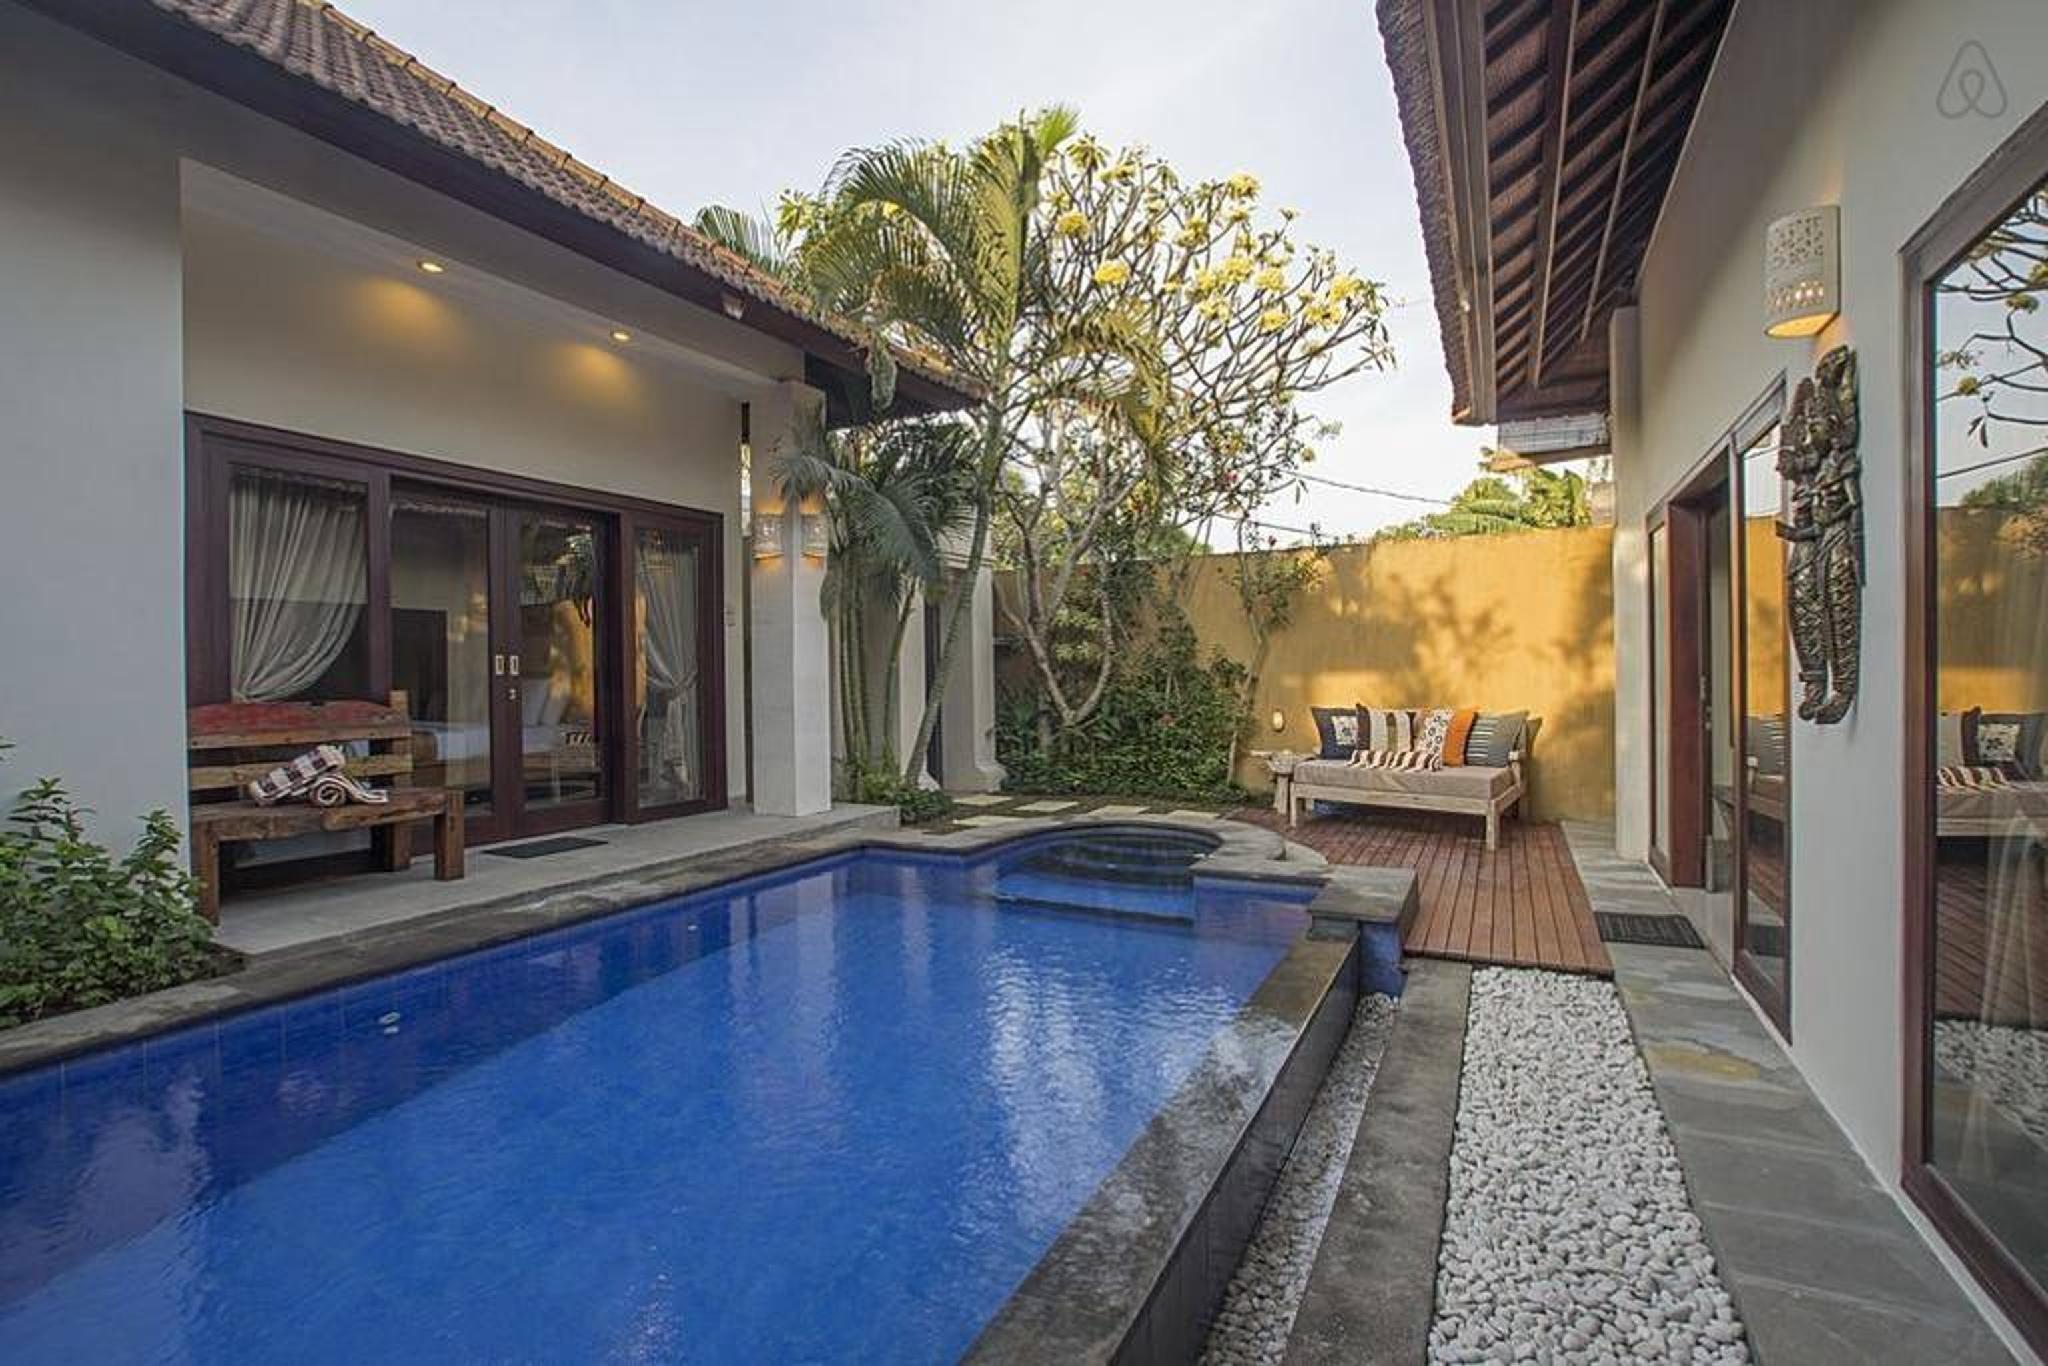 2 Bedroom Villa in Central Seminyak